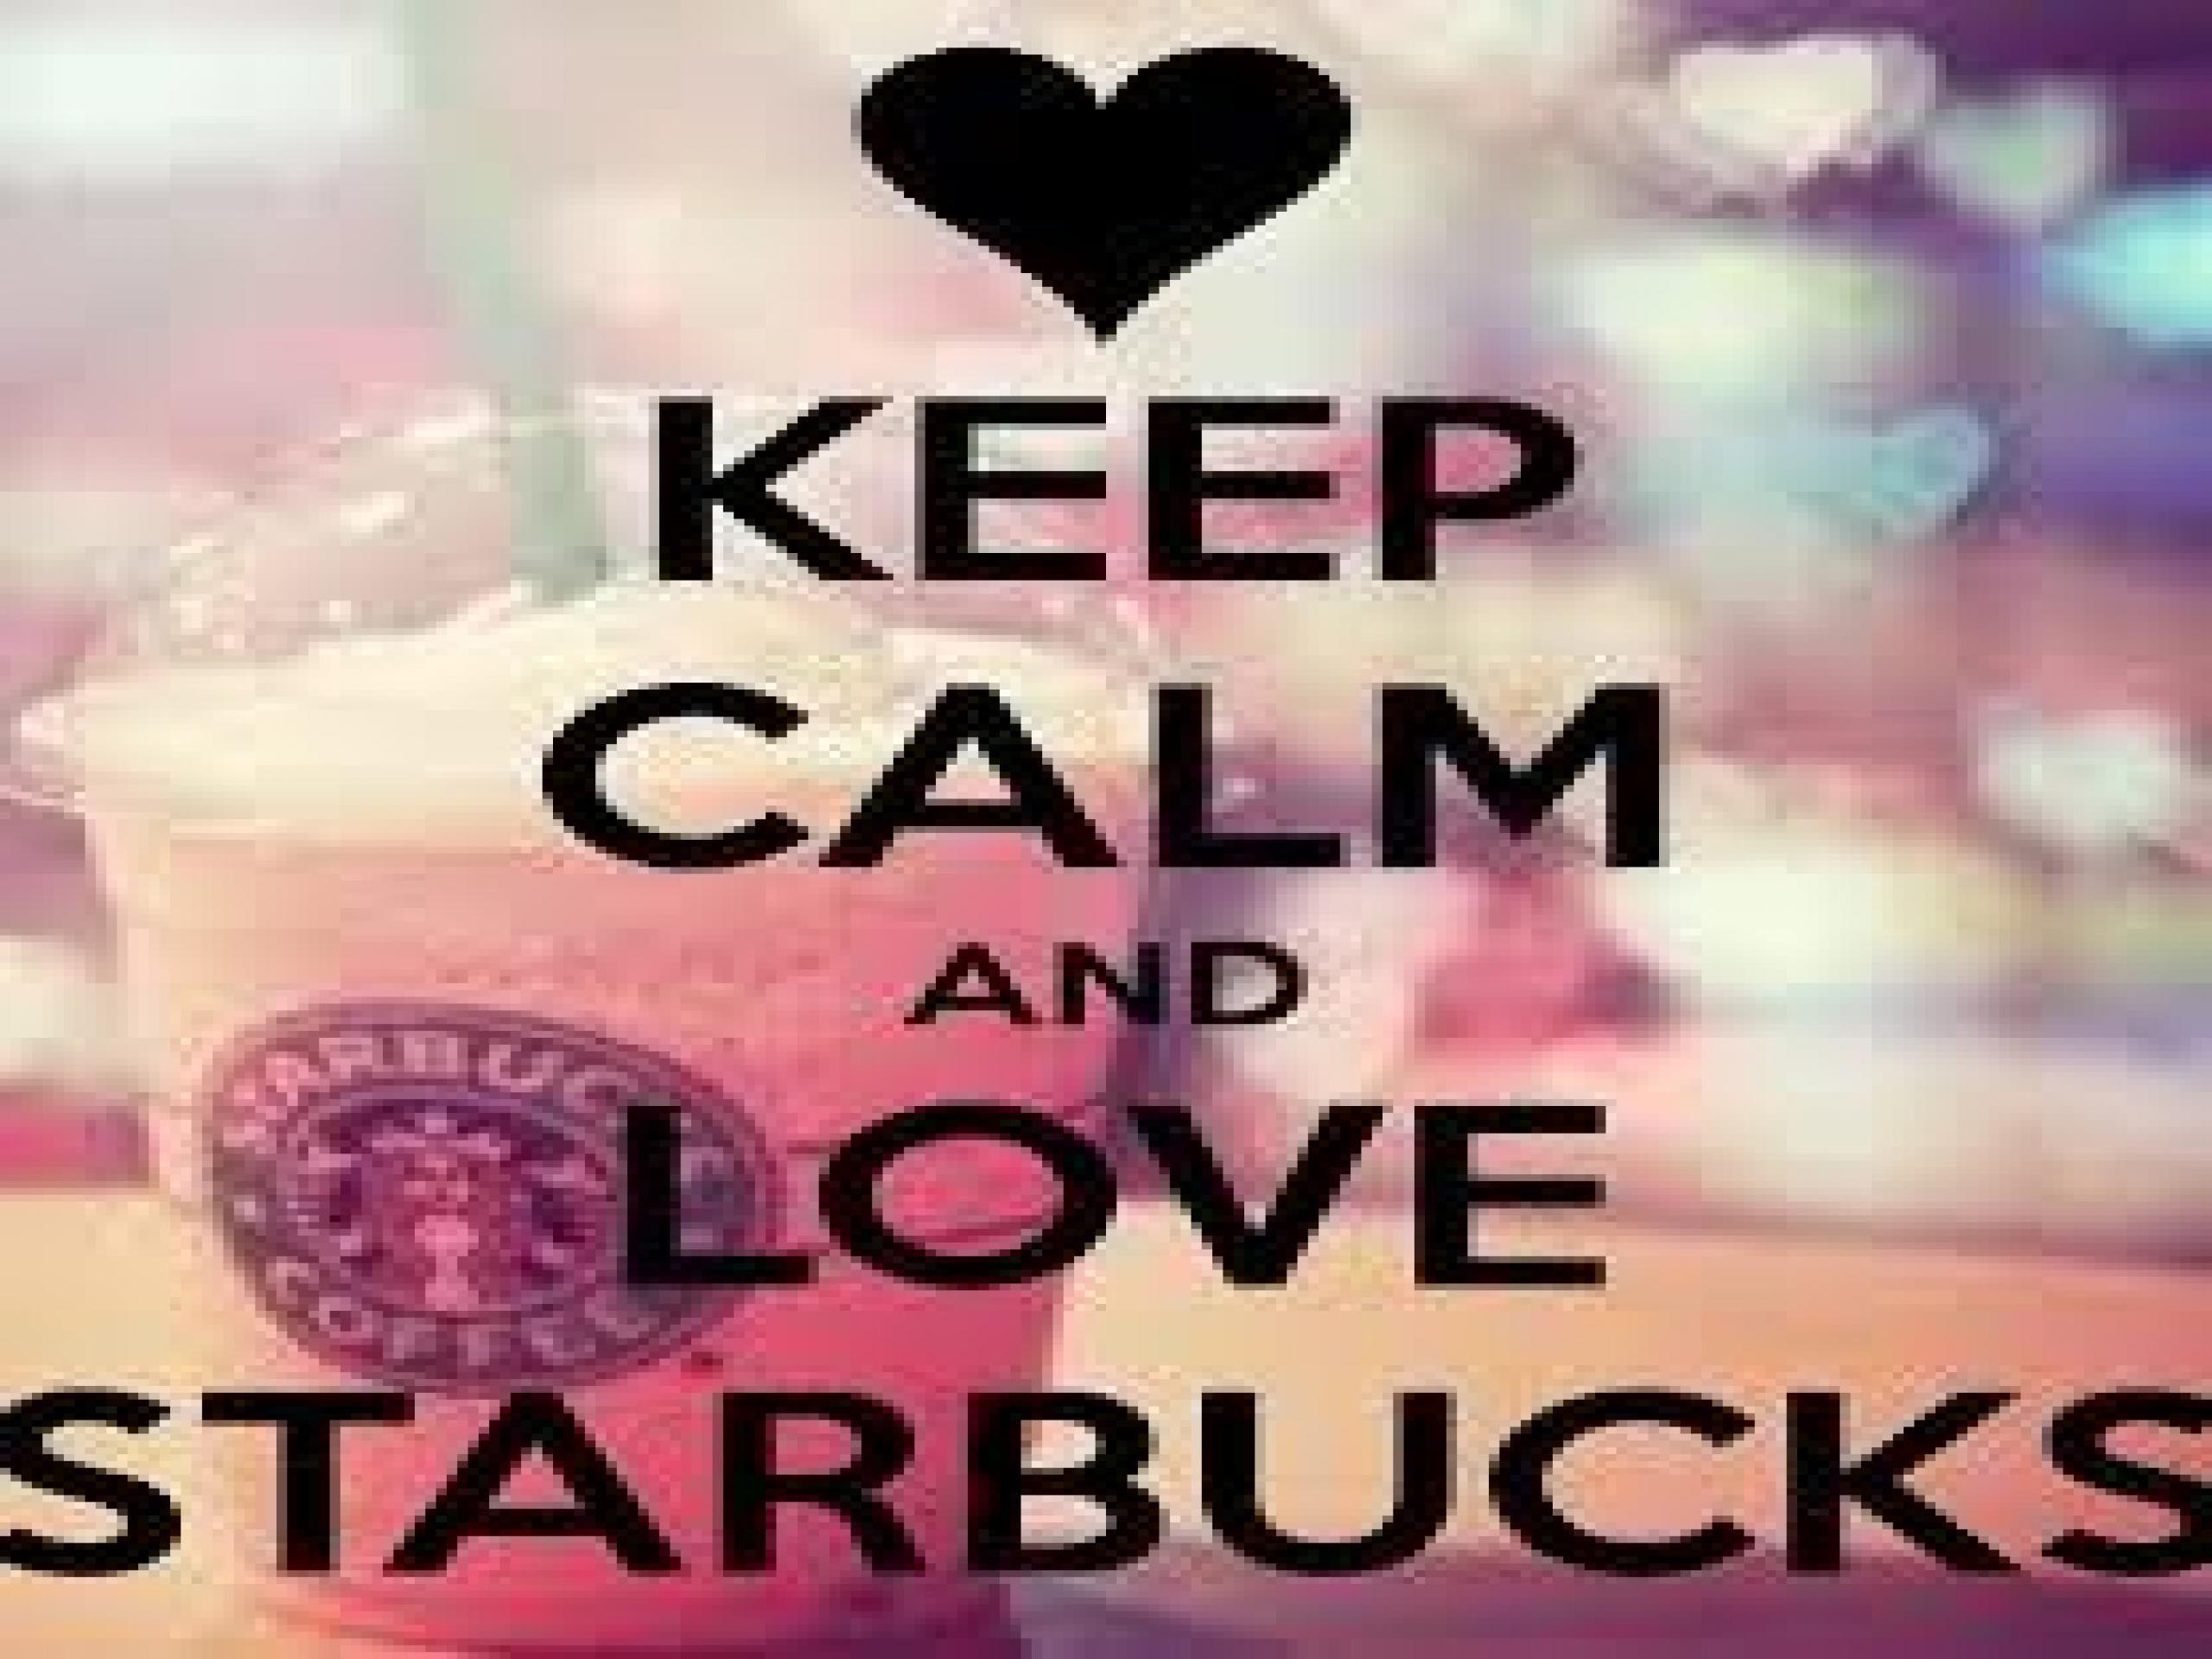 Starbucks Drinks Wallpapers - Wallpaper